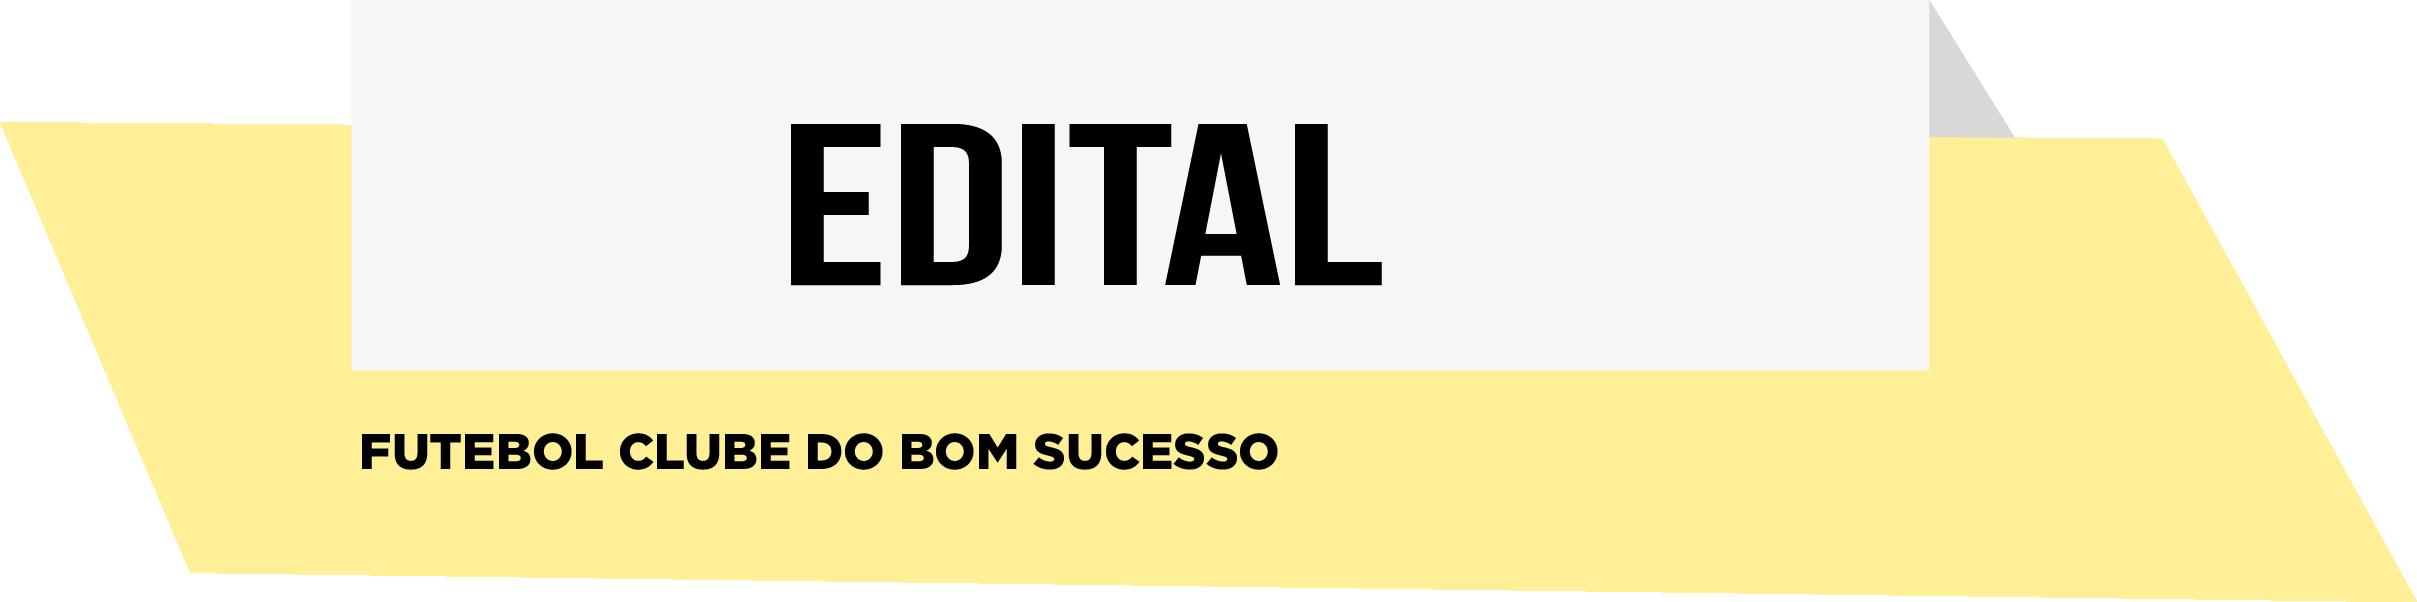 EDITAL- Futebol Clube Bom Sucesso